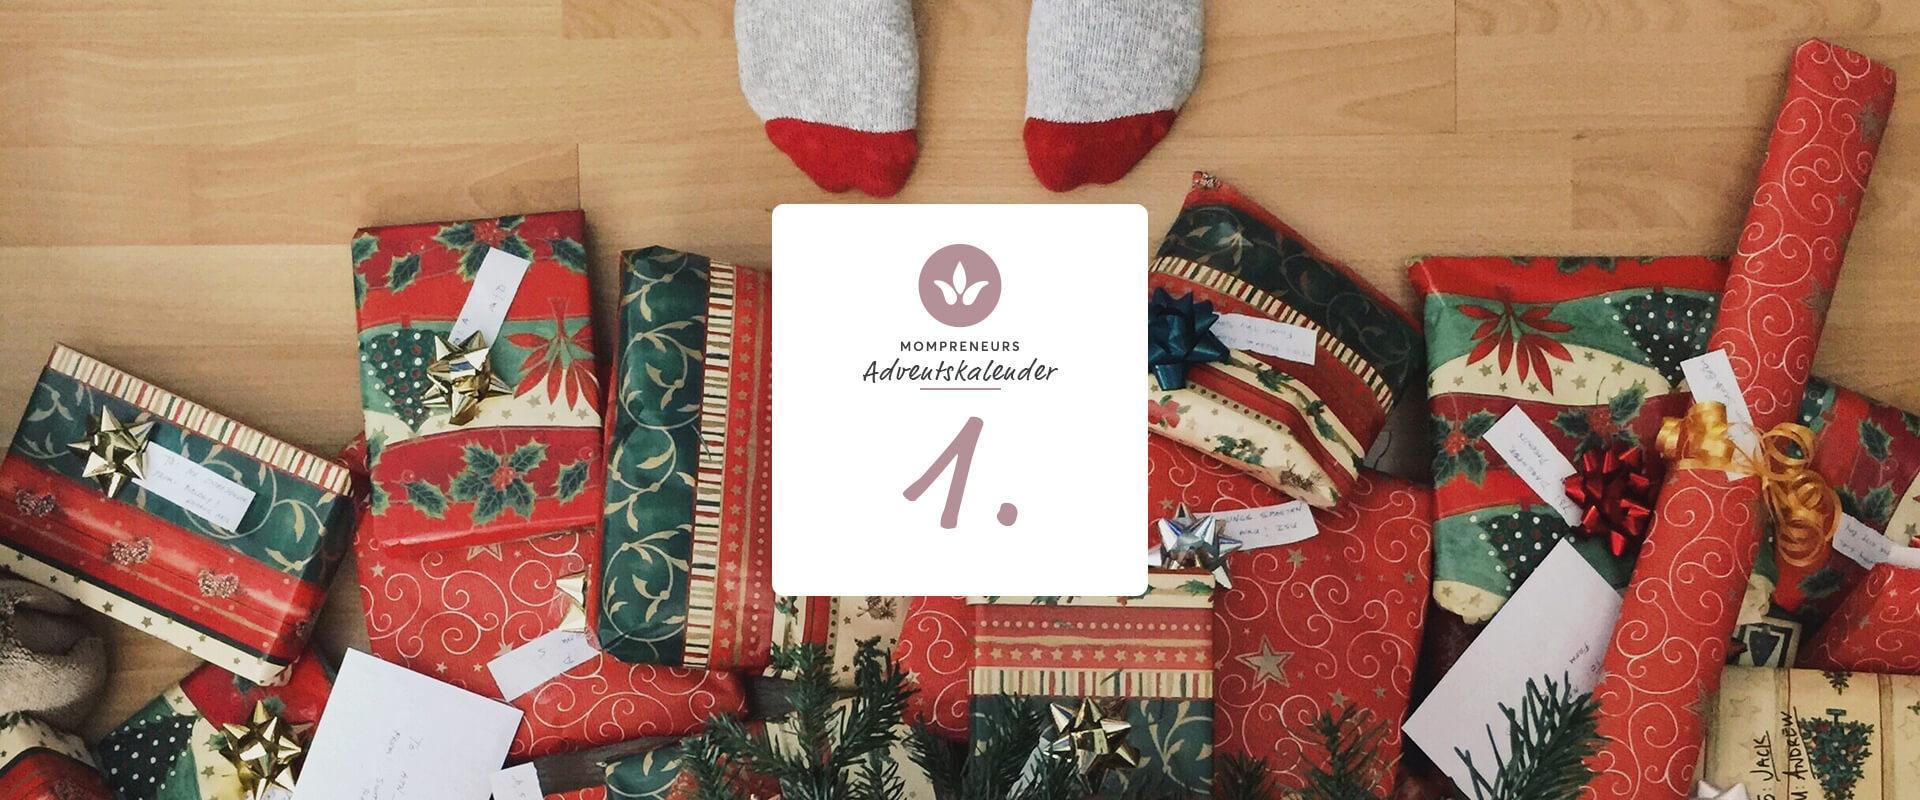 mompreneurs_adventskalender_inka_naujack1